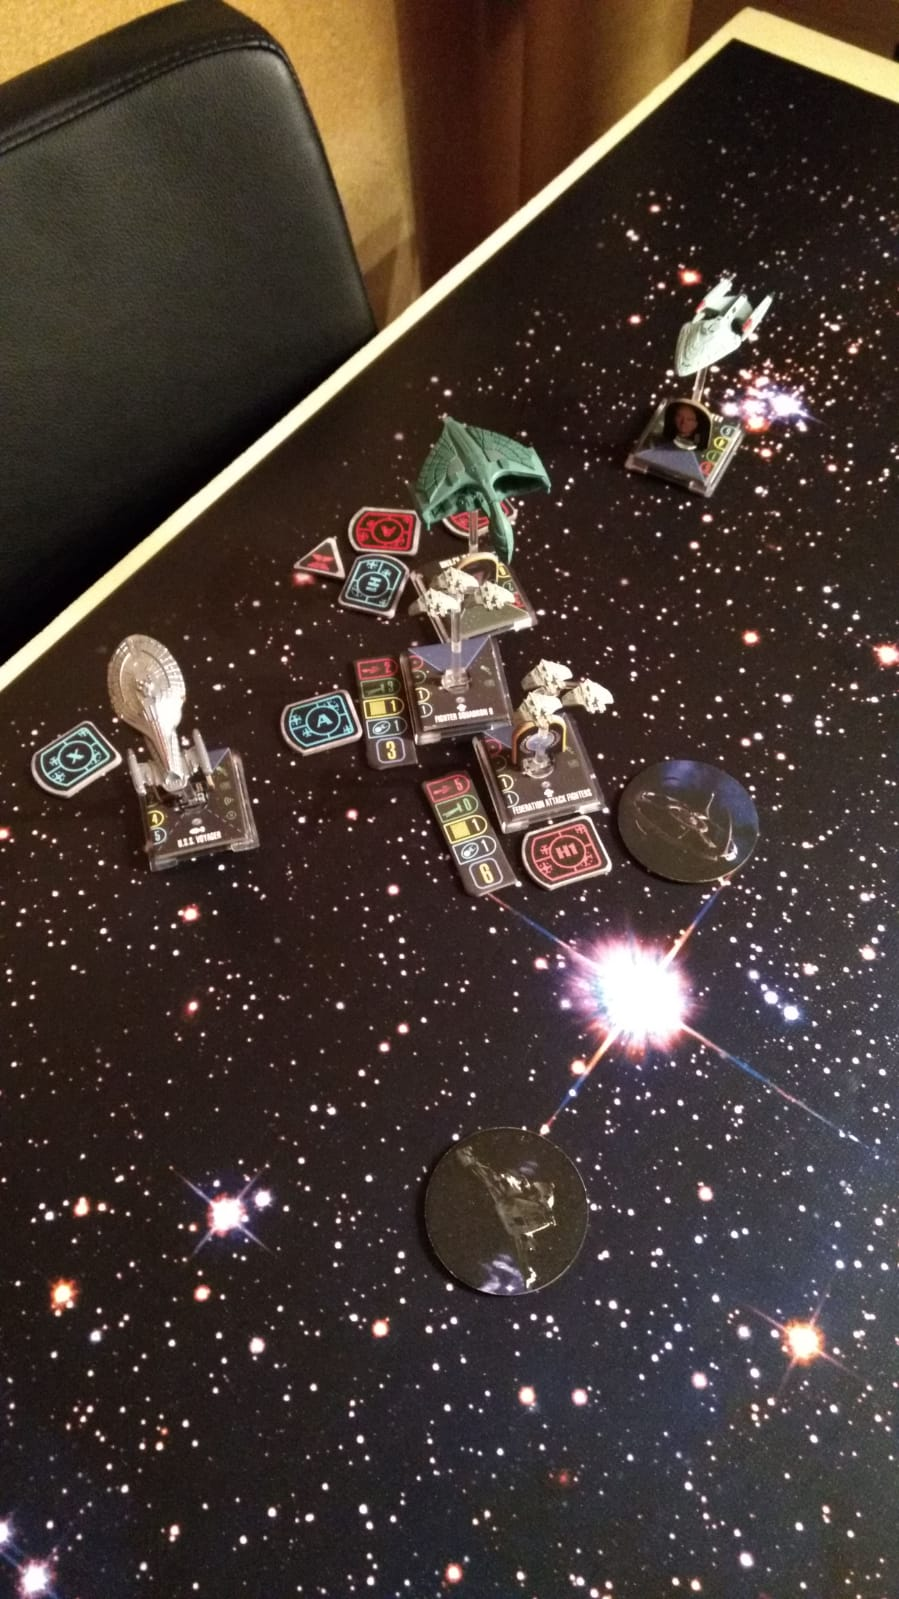 Kampf um Jouret [Föd. vs. Romulaner] Spiel112